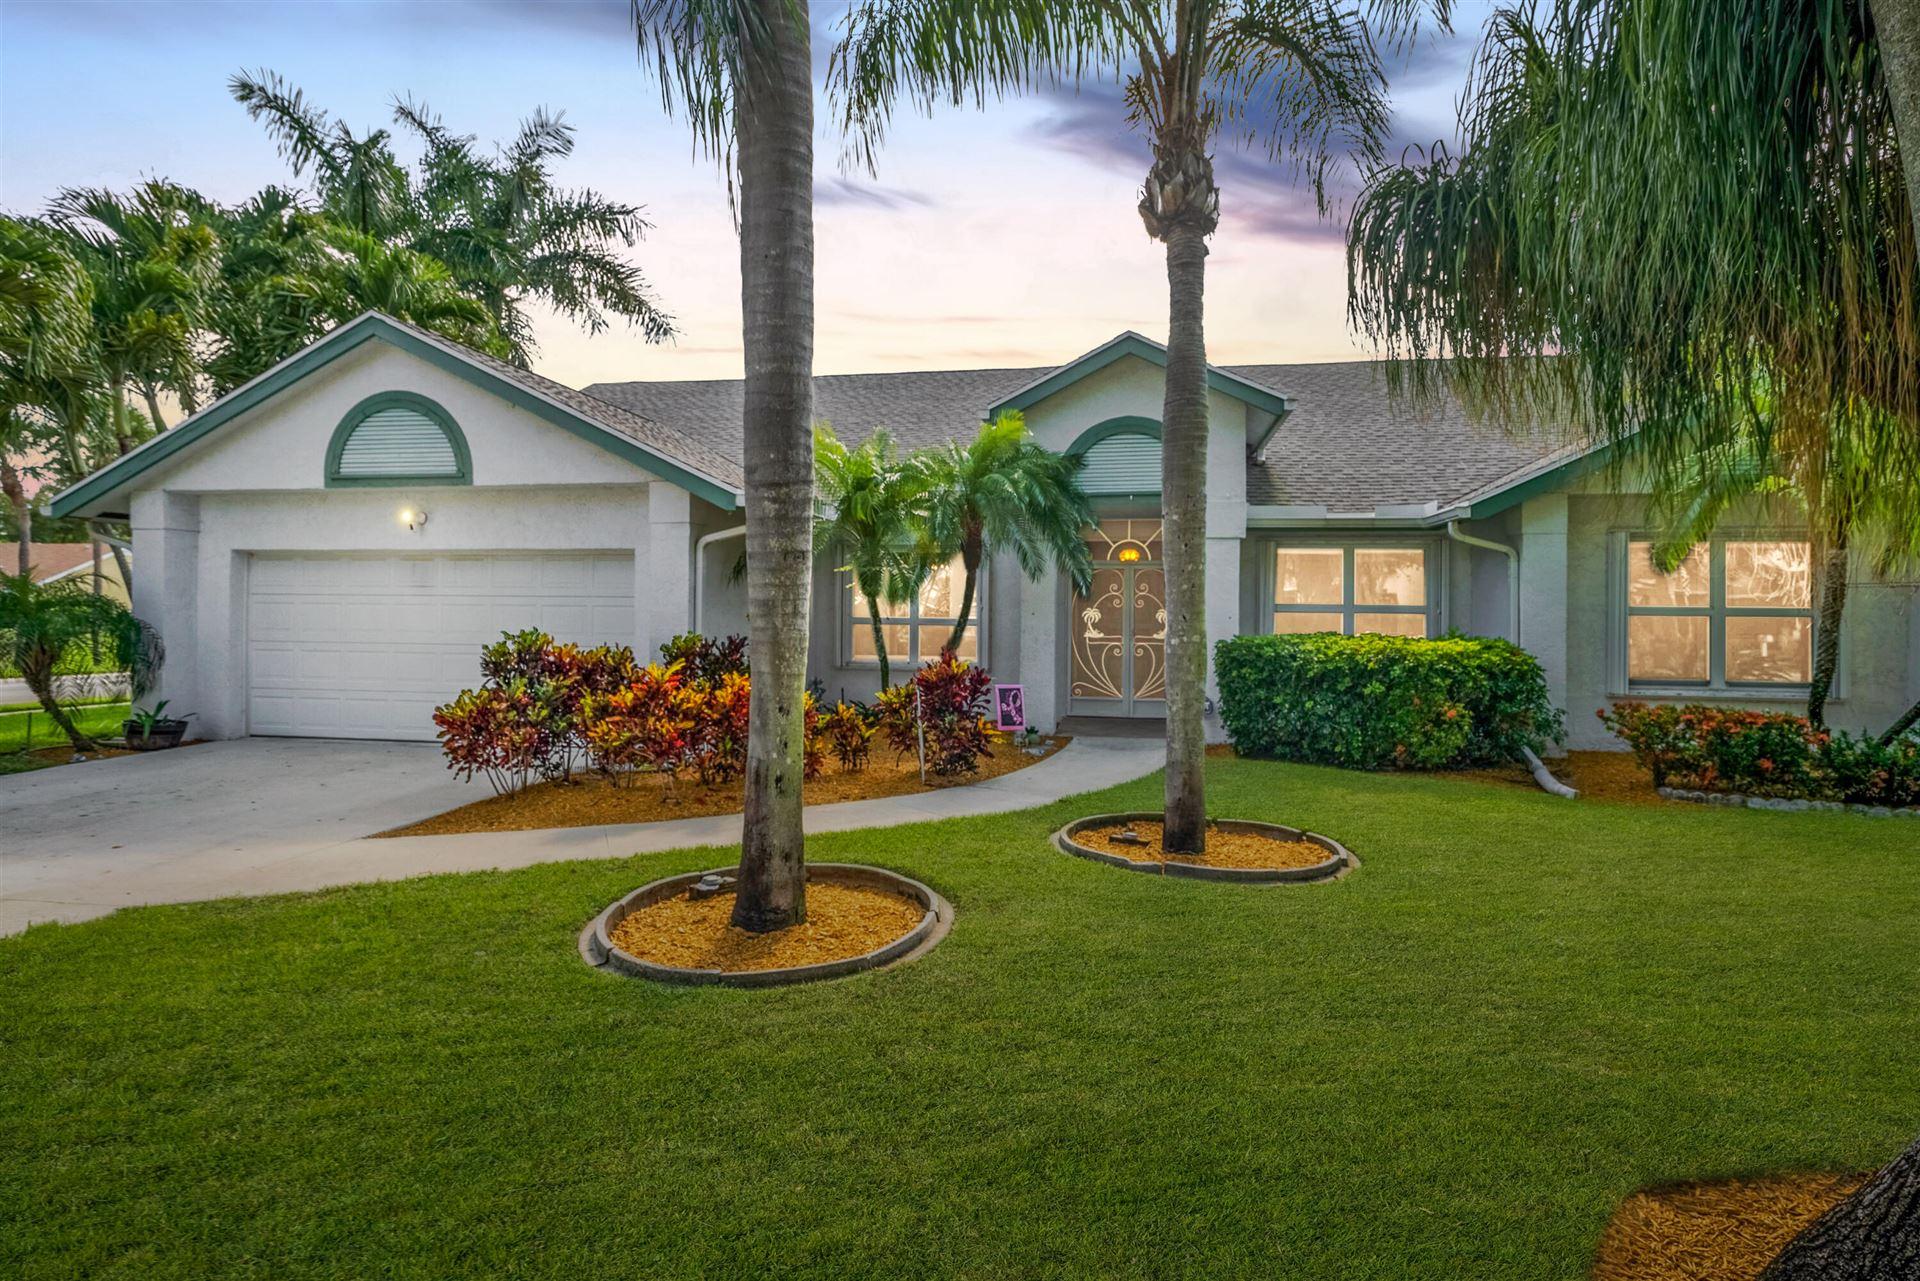 722 Golf Court, Delray Beach, FL 33445 - MLS#: RX-10720888